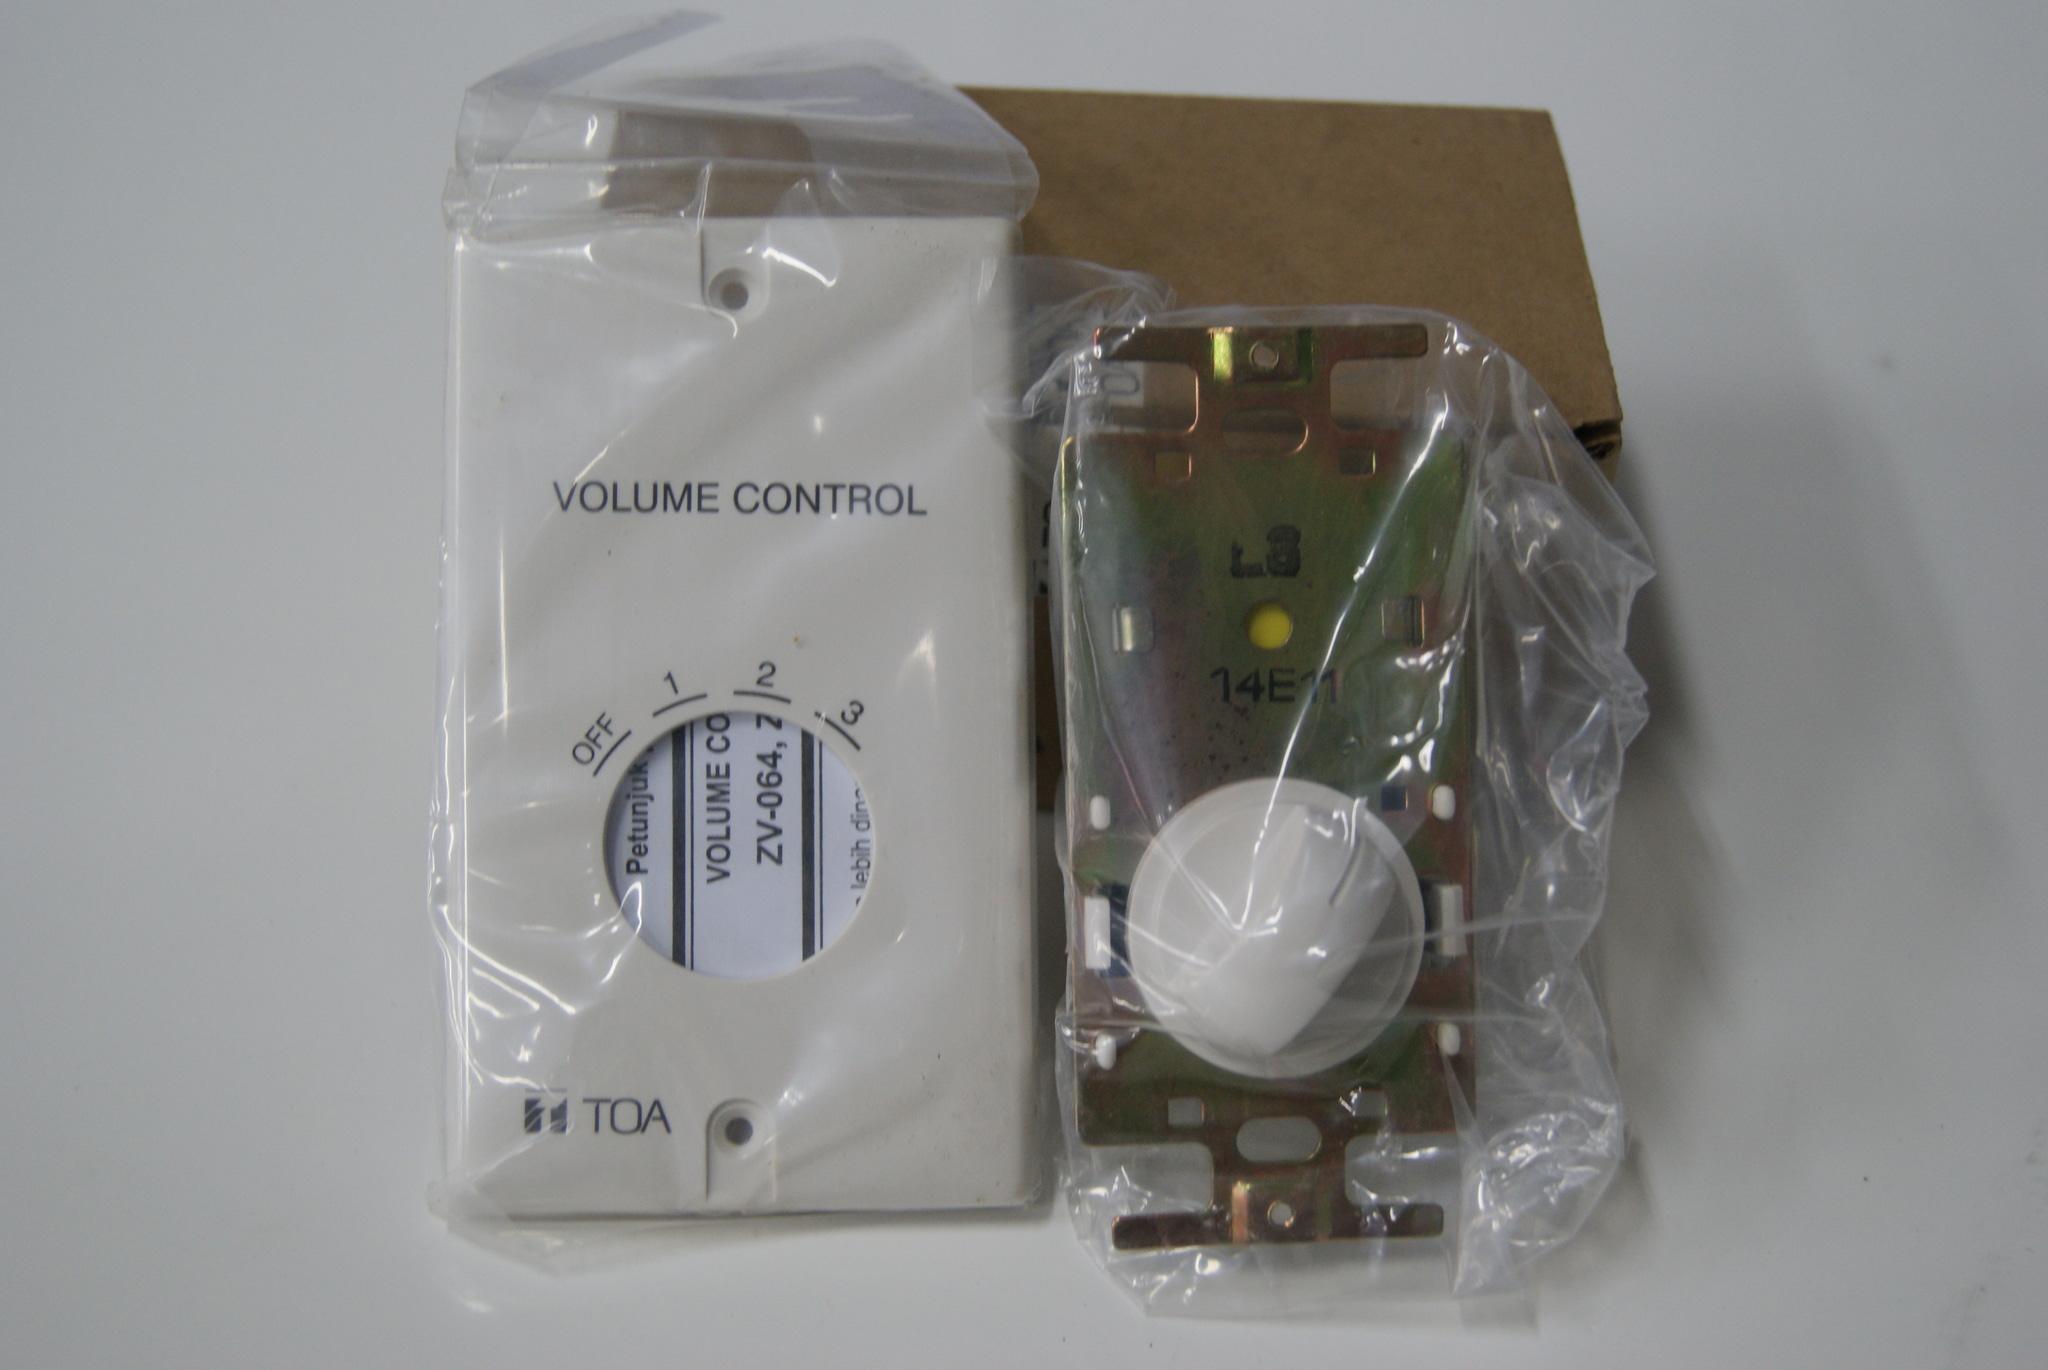 Jual Produk Sun Elektronik Online Termurah Toa Zw G810 Volume Control Attenuator Zv303